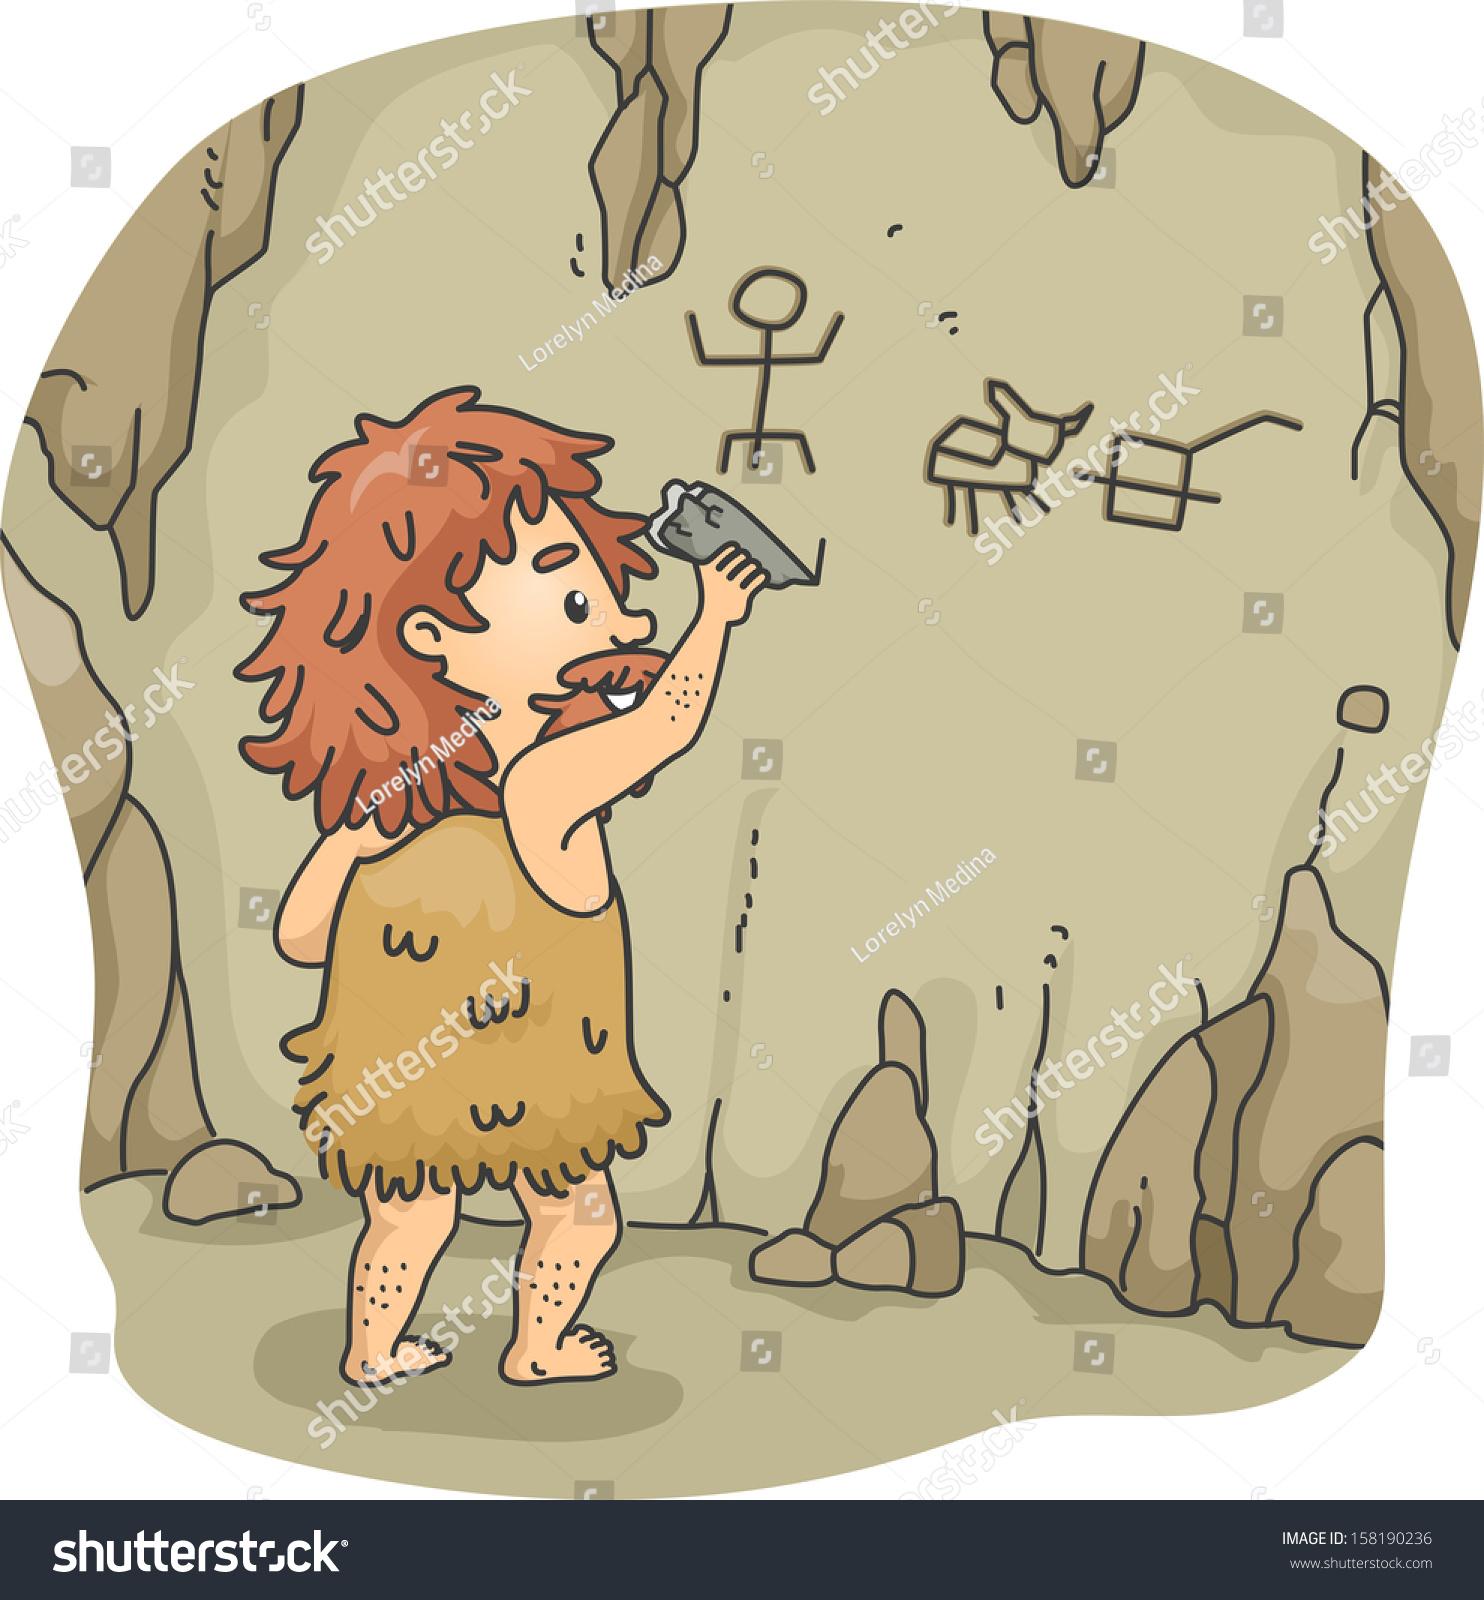 Caveman Stone : Illustration caveman etching figures on walls stock vector